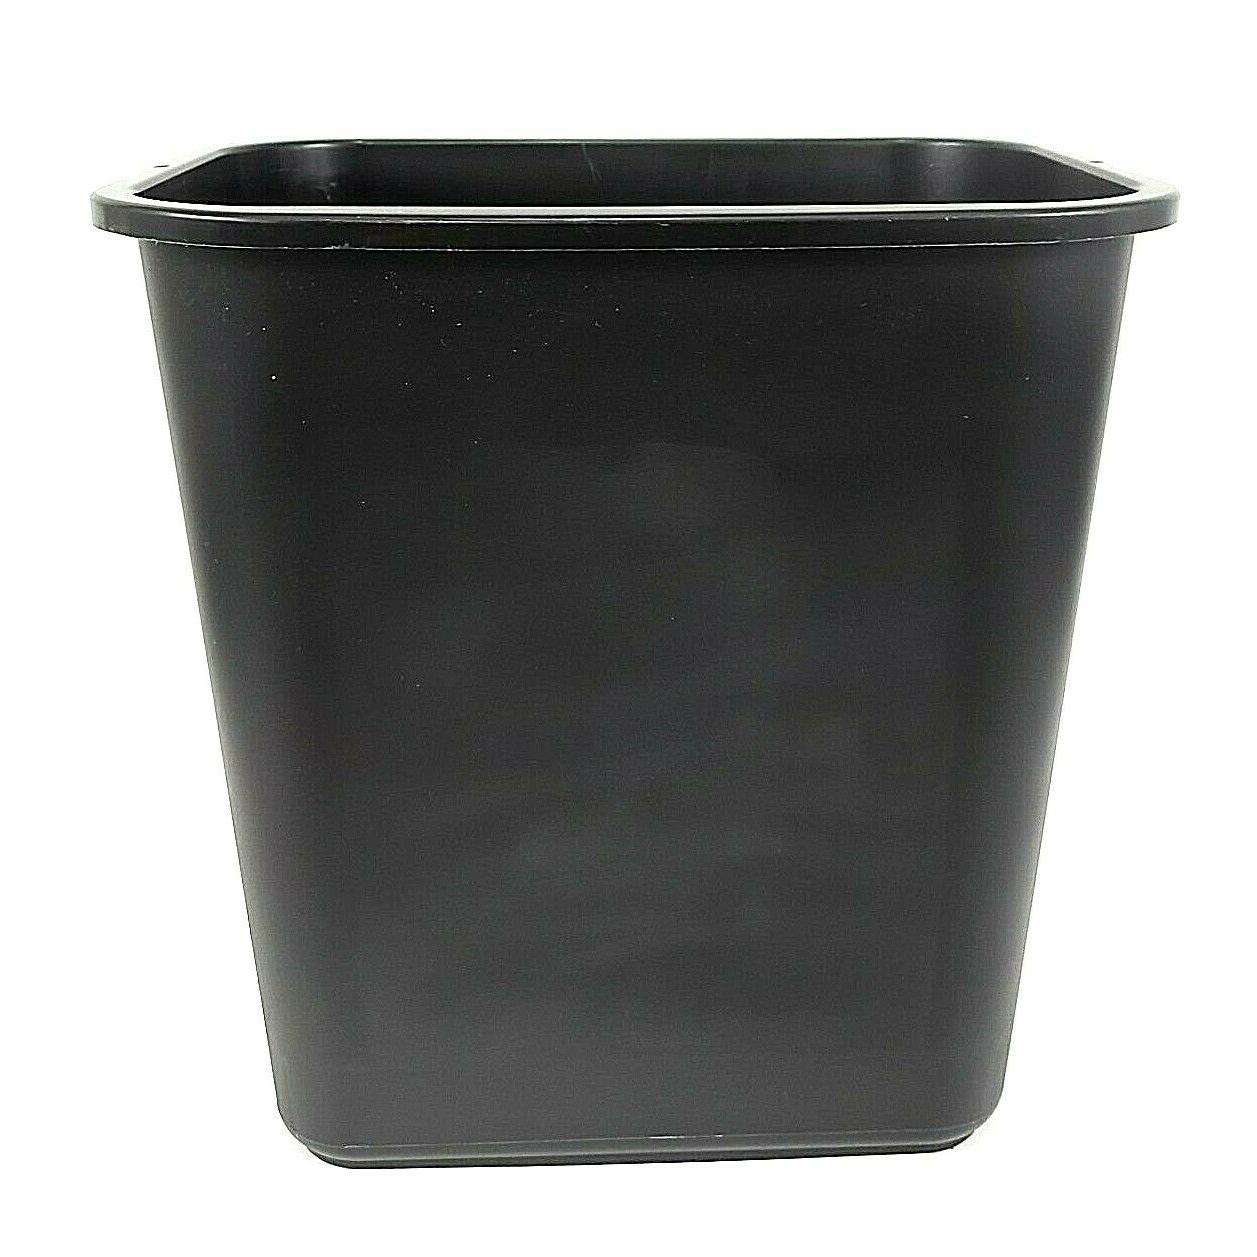 trash can 7 gal plastic blk rectangular